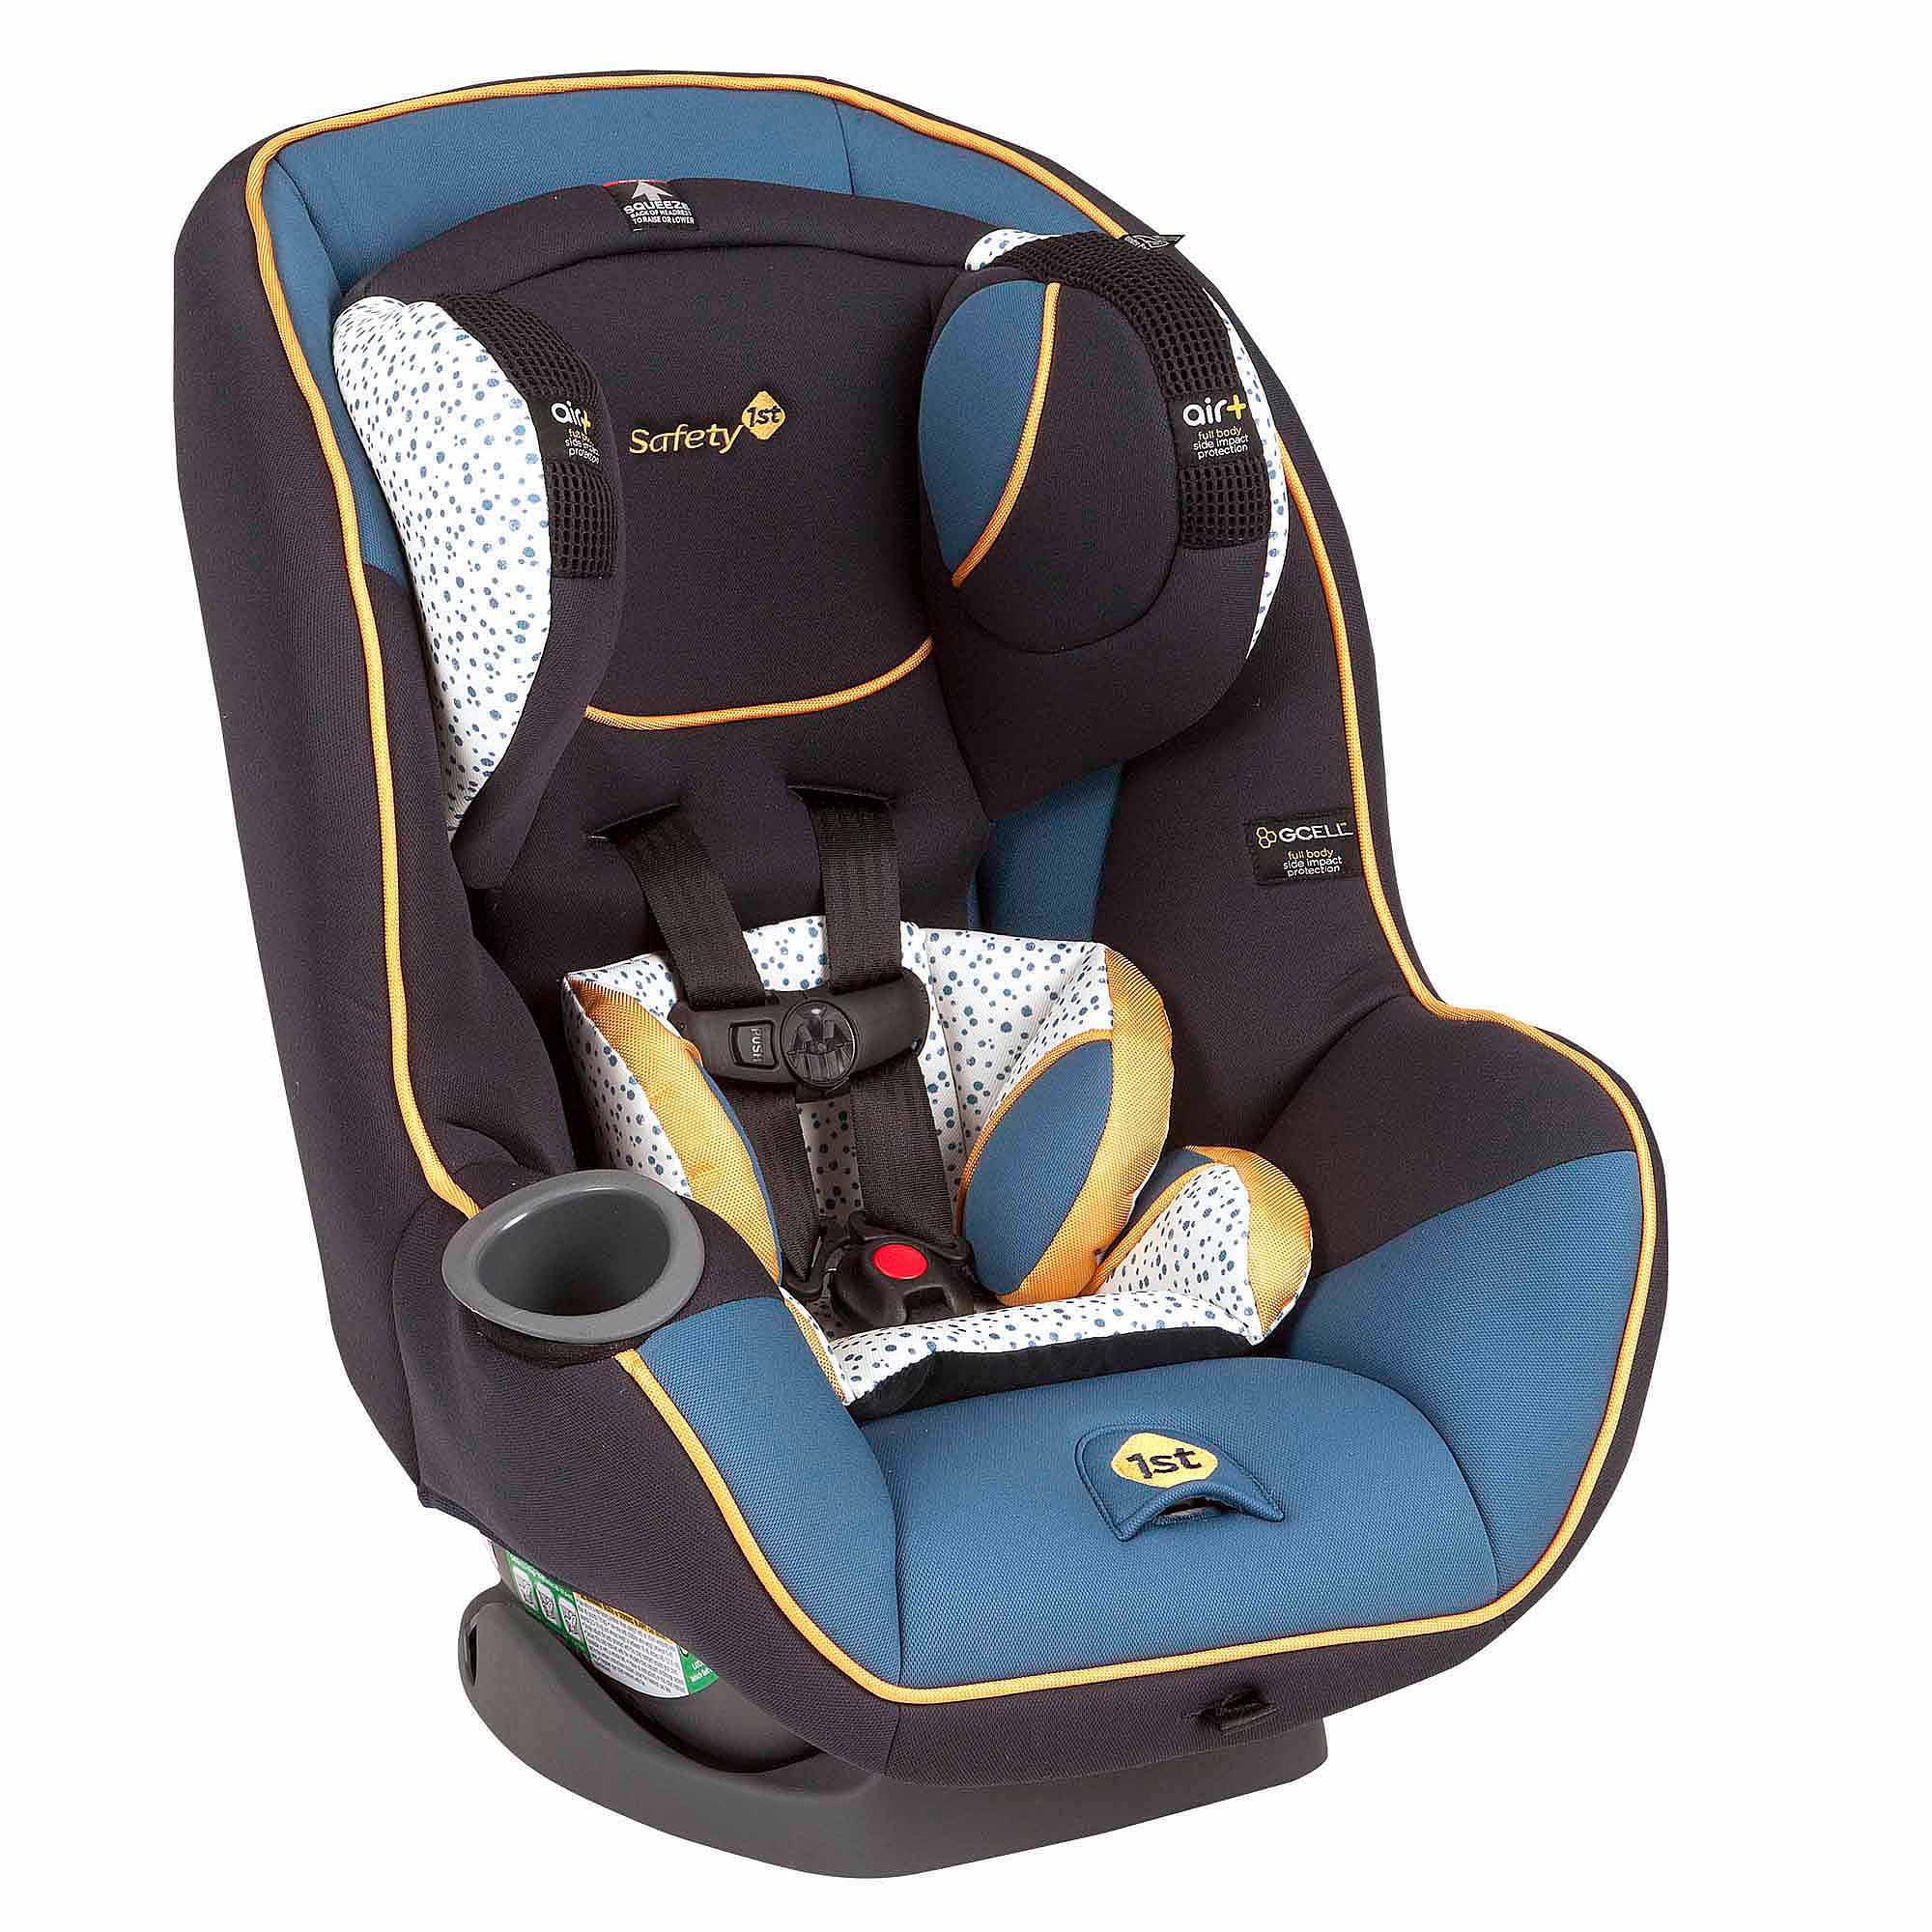 Safety 1st advance convertible car seat se 65 air twist of citrus